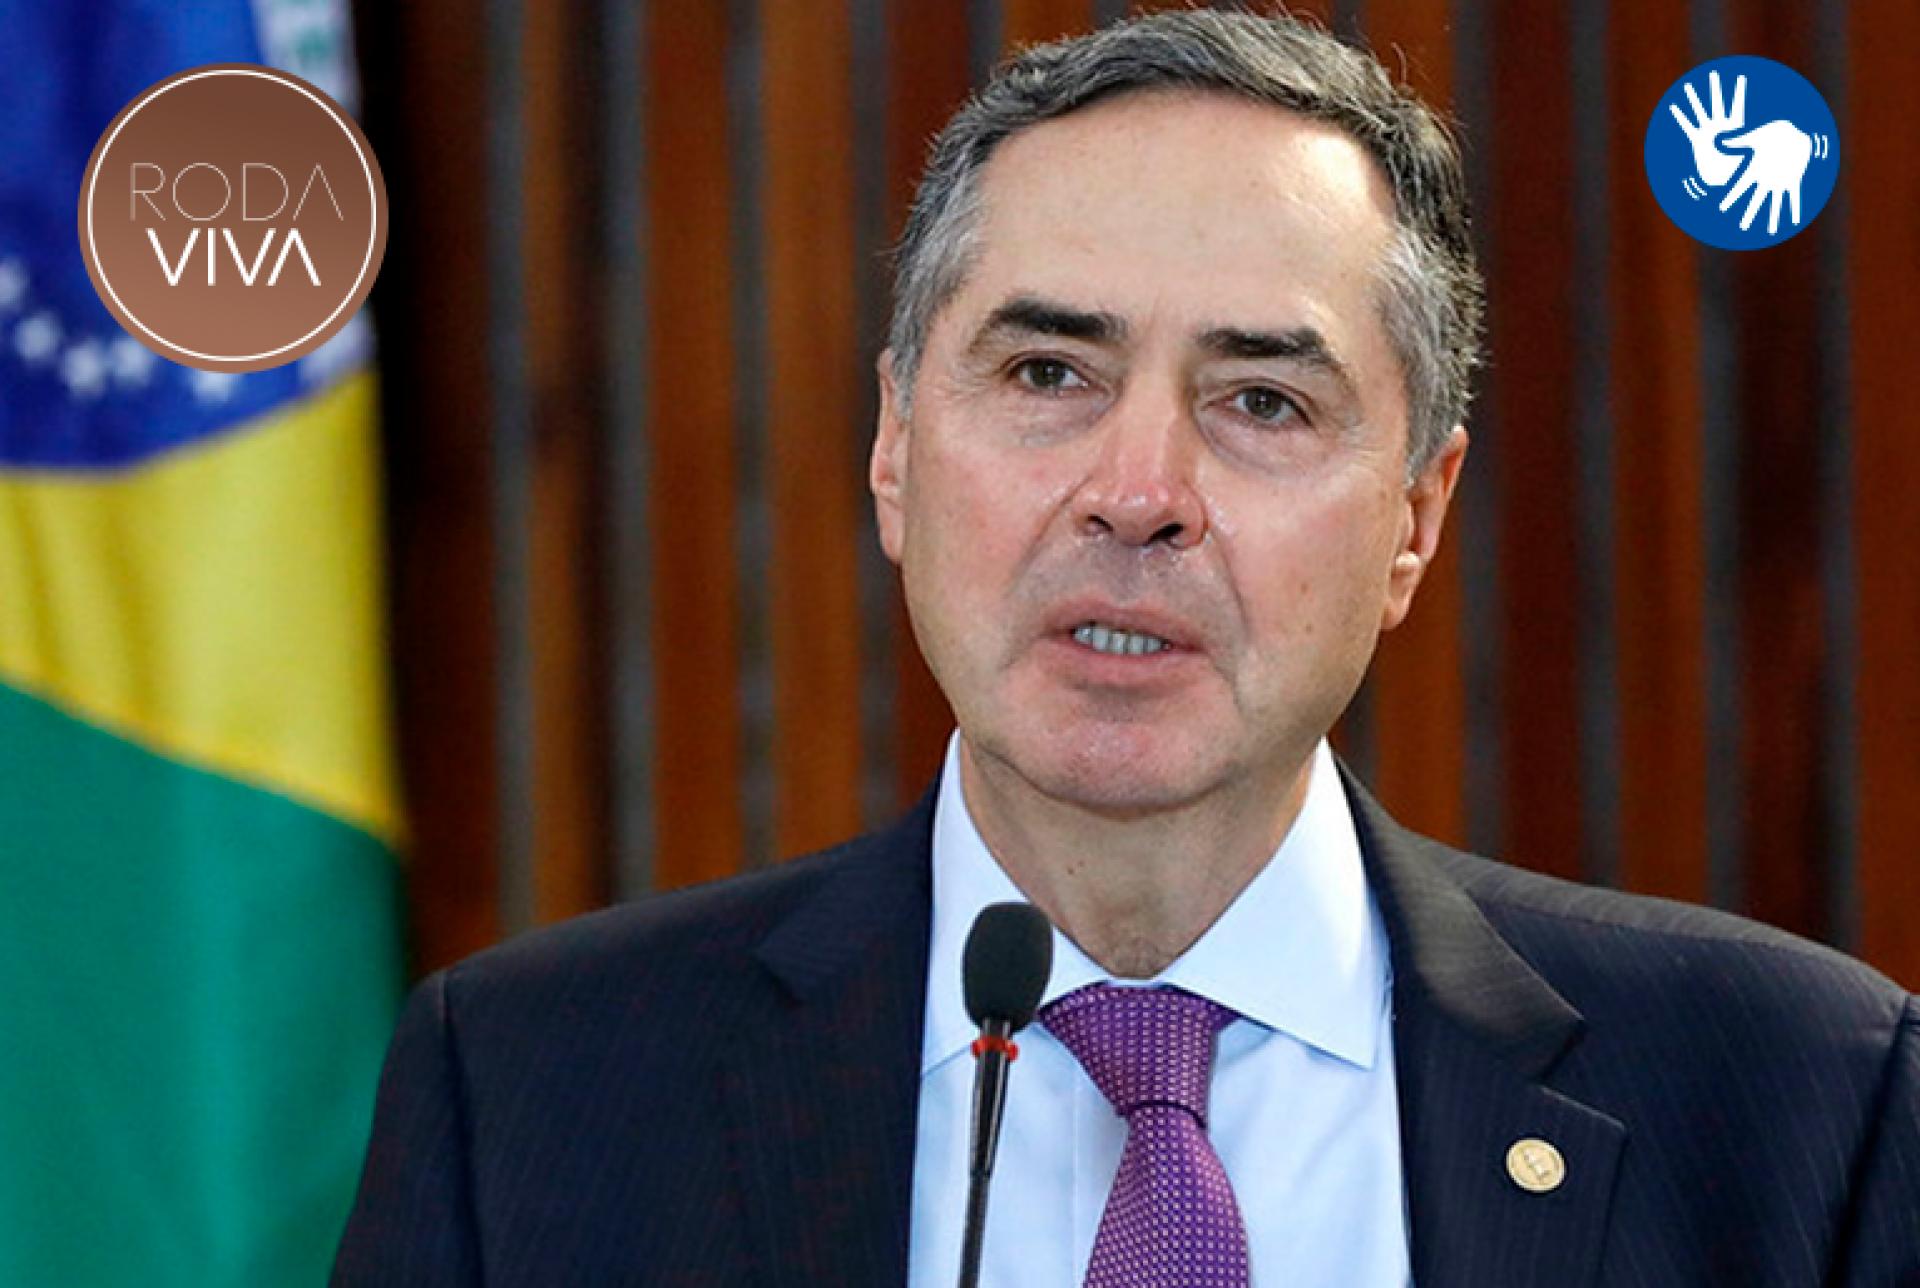 Ministro Luís Roberto Barroso